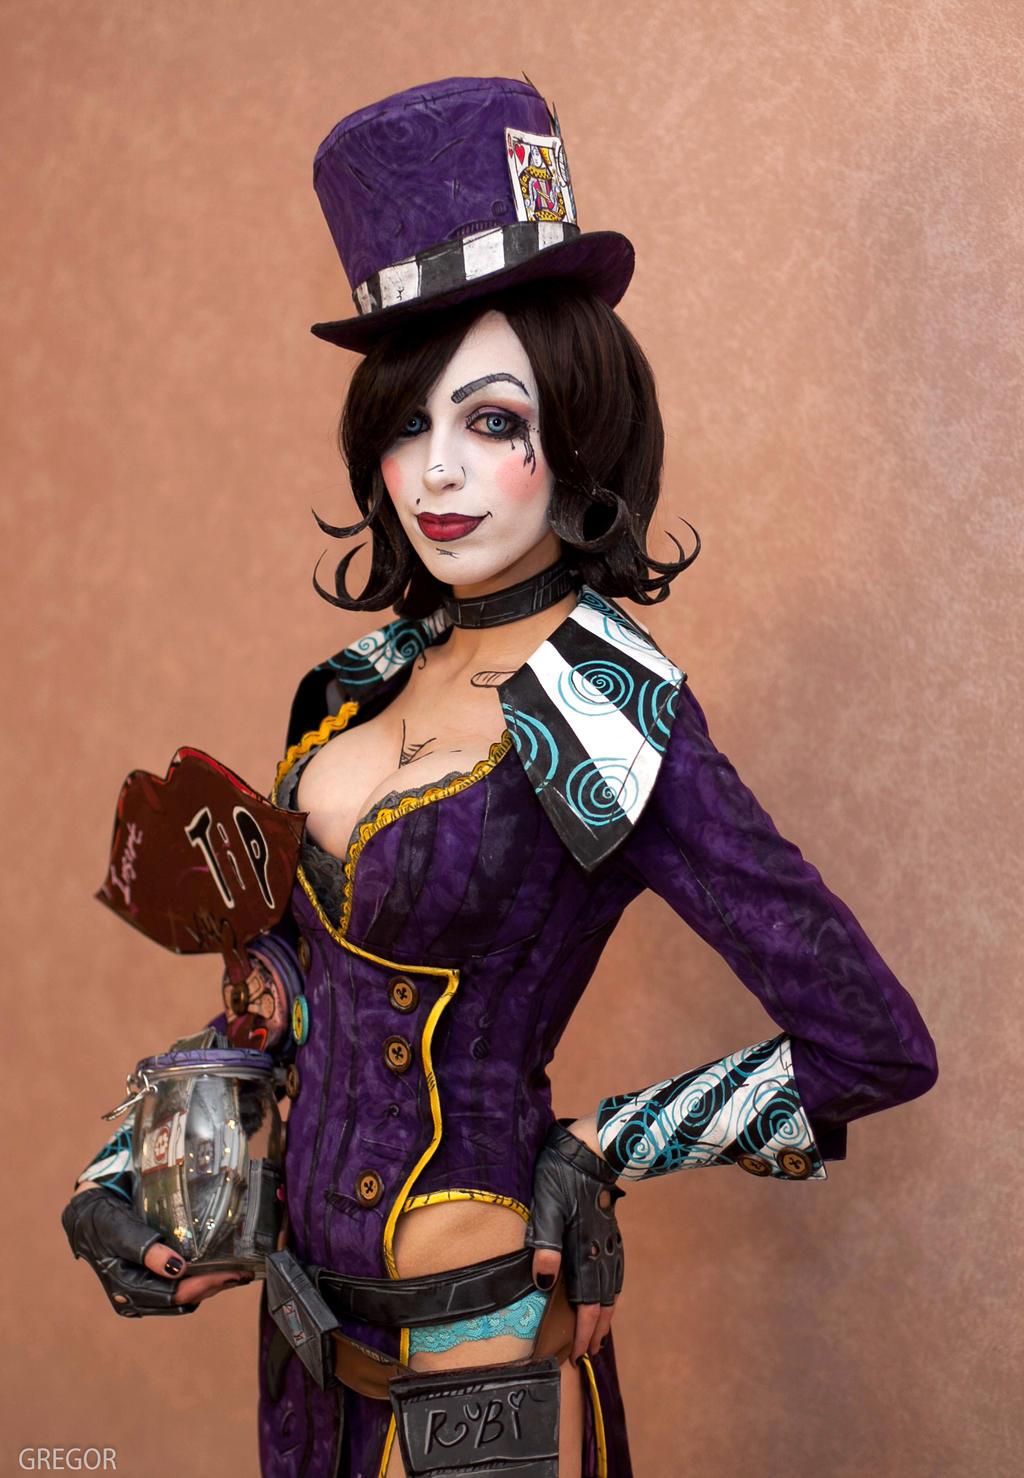 mad cosplay 2 Borderlands moxxi